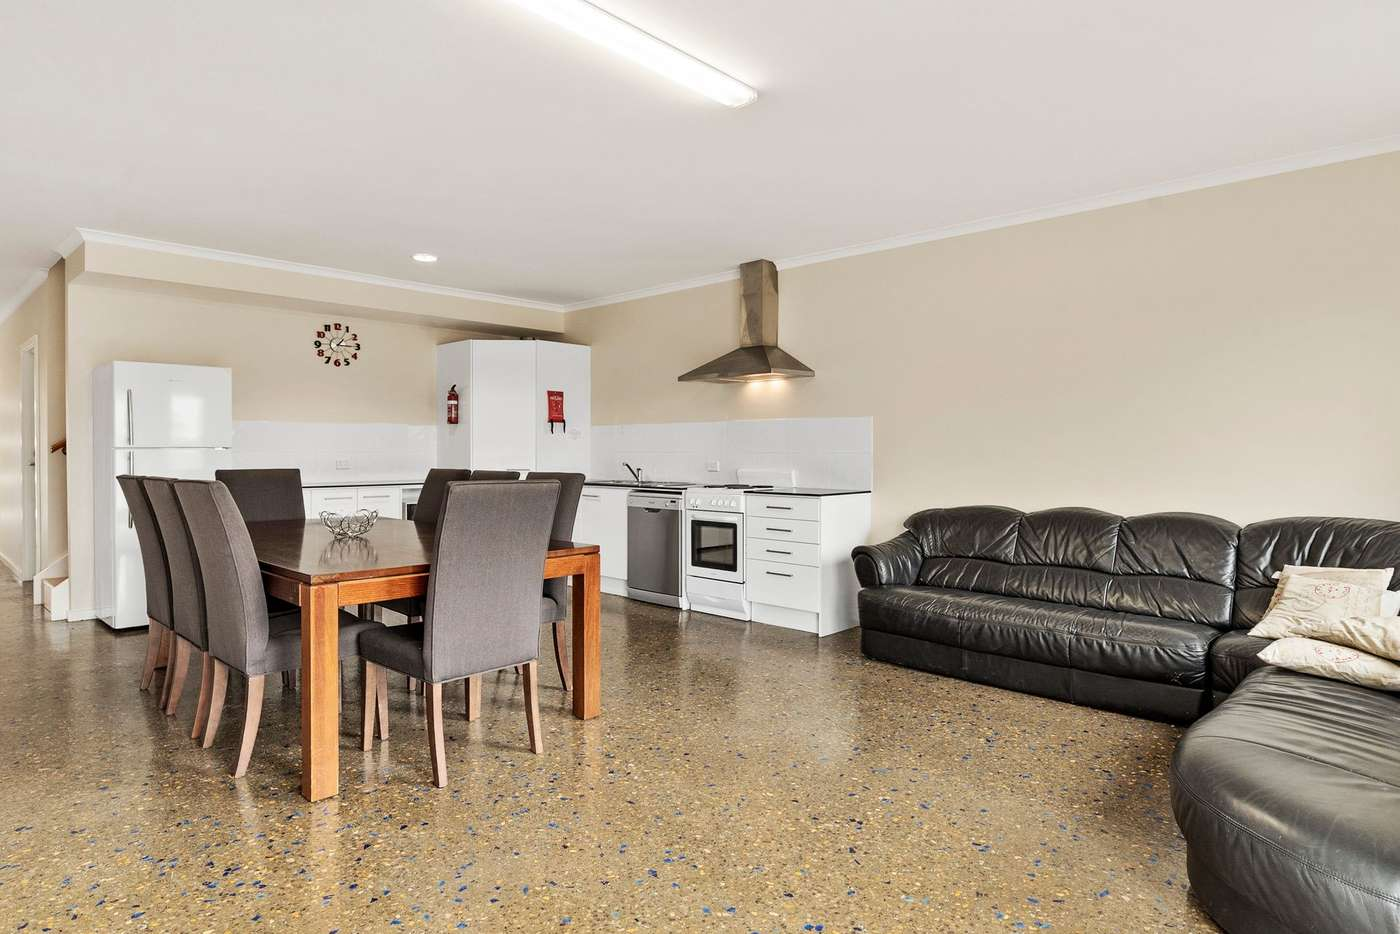 Sixth view of Homely house listing, 10A Charles Carter Way, Edithburgh SA 5583